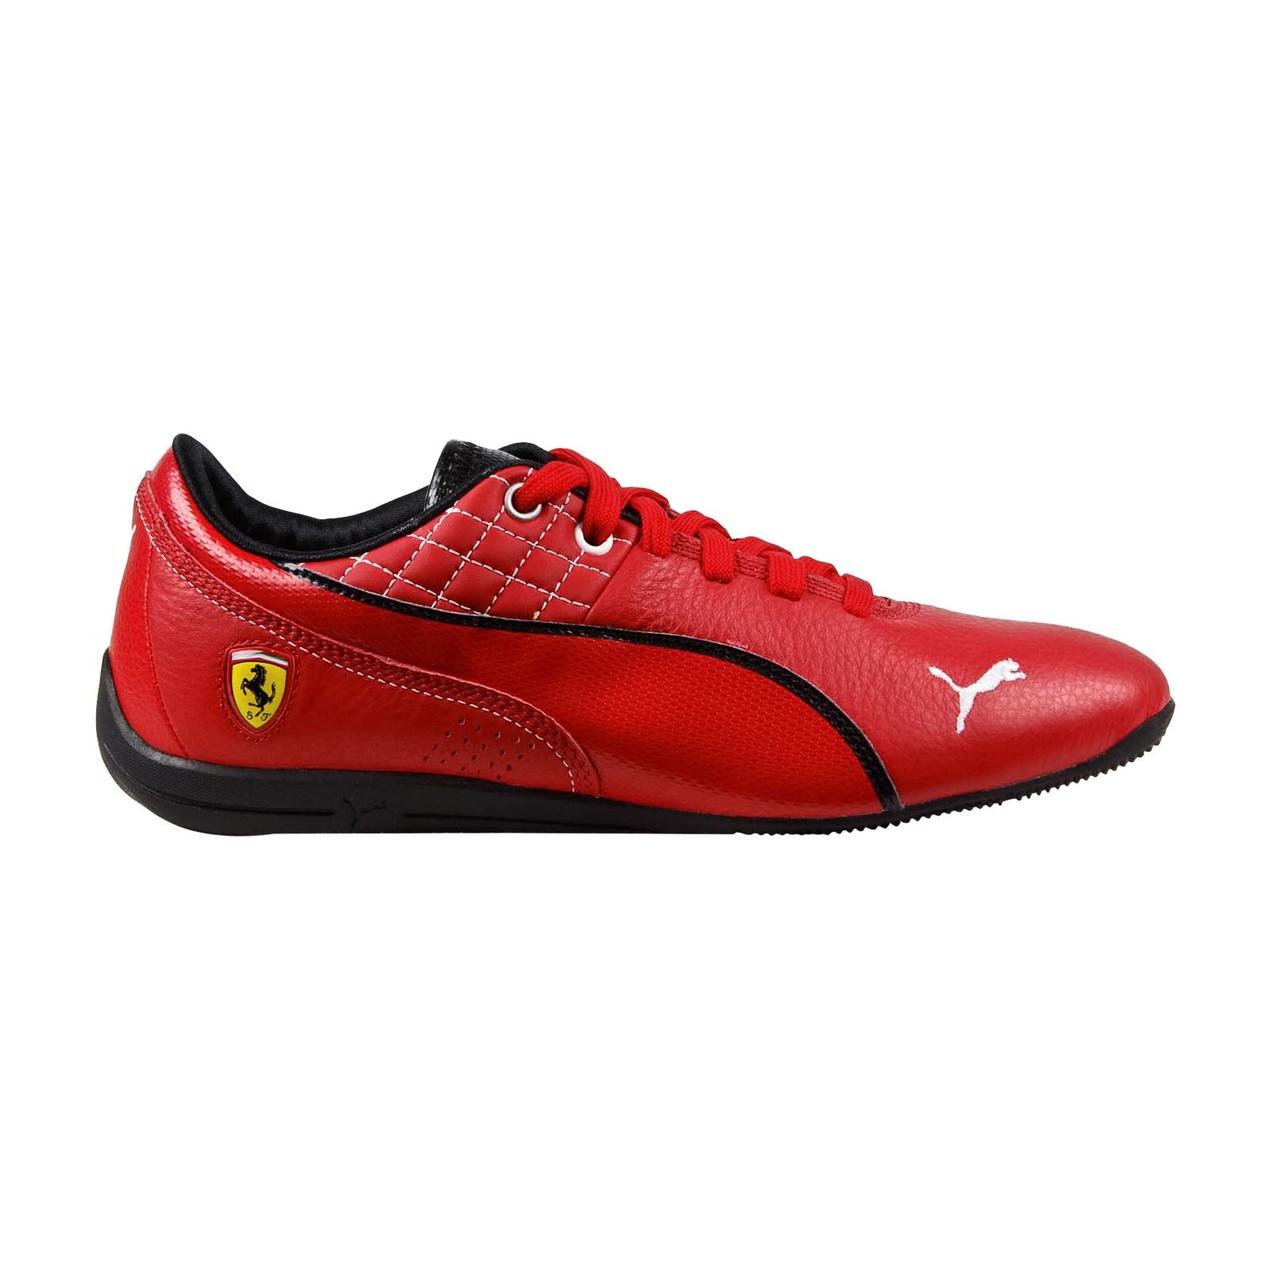 6e8fefd1860 Puma Ferrari Mens Drift Cat 6 SF Flash Shoes - Tanga